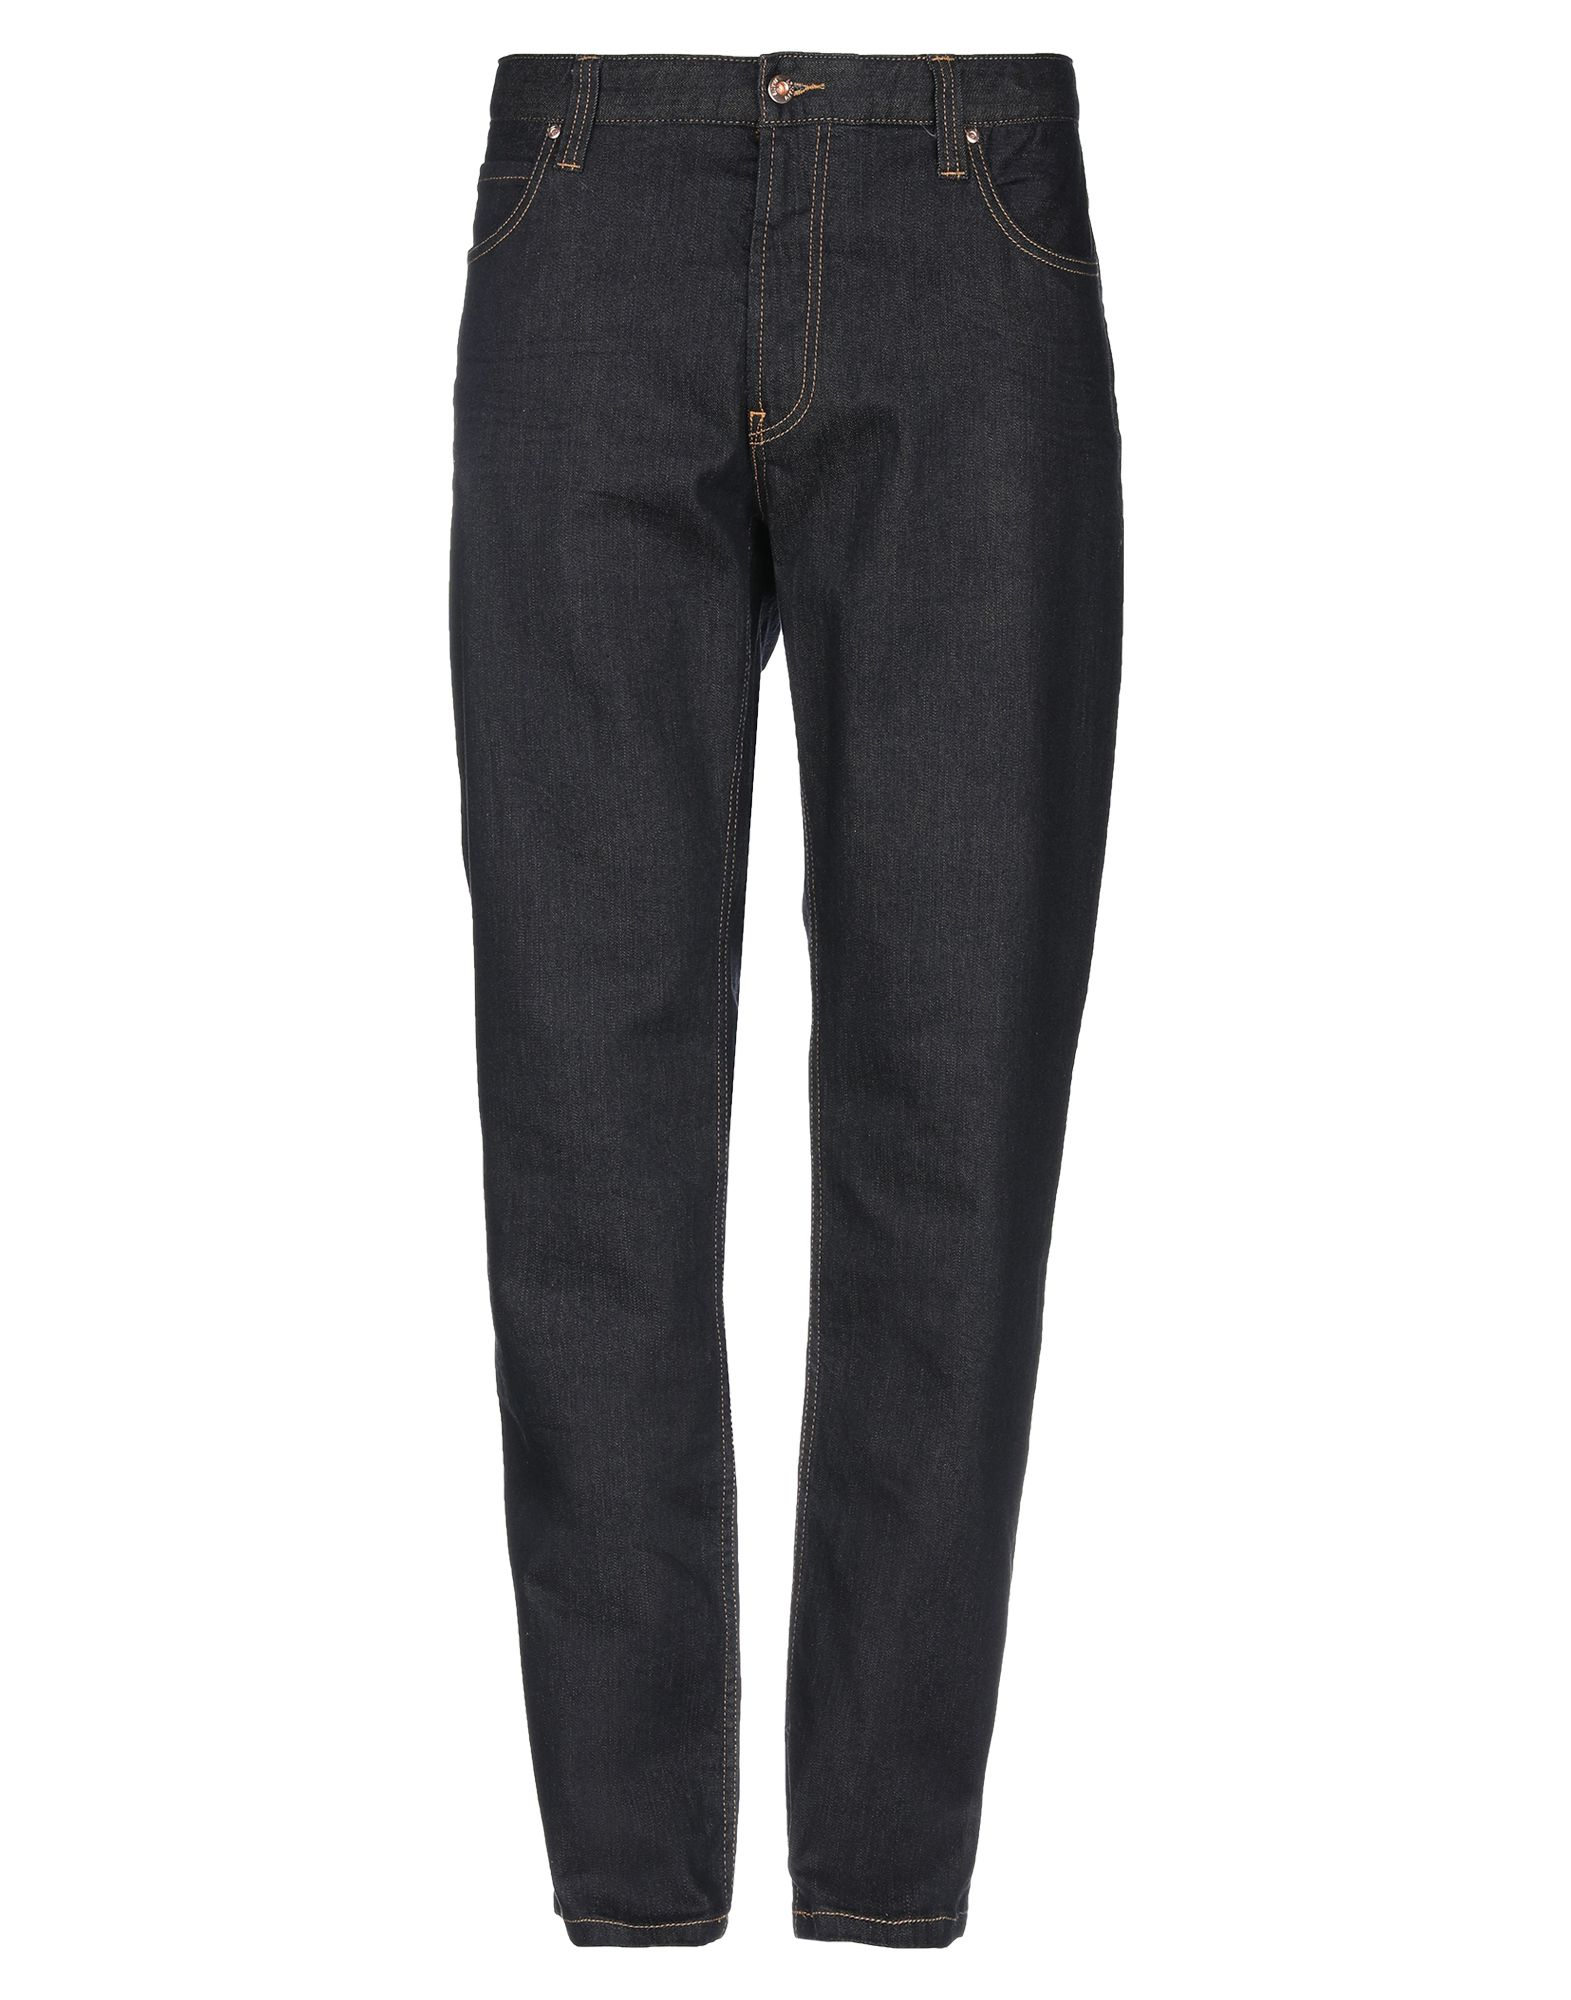 Pantaloni Pantaloni Jeans Armani Jeans uomo - 42760314FP  Das neueste Marken-Outlet online